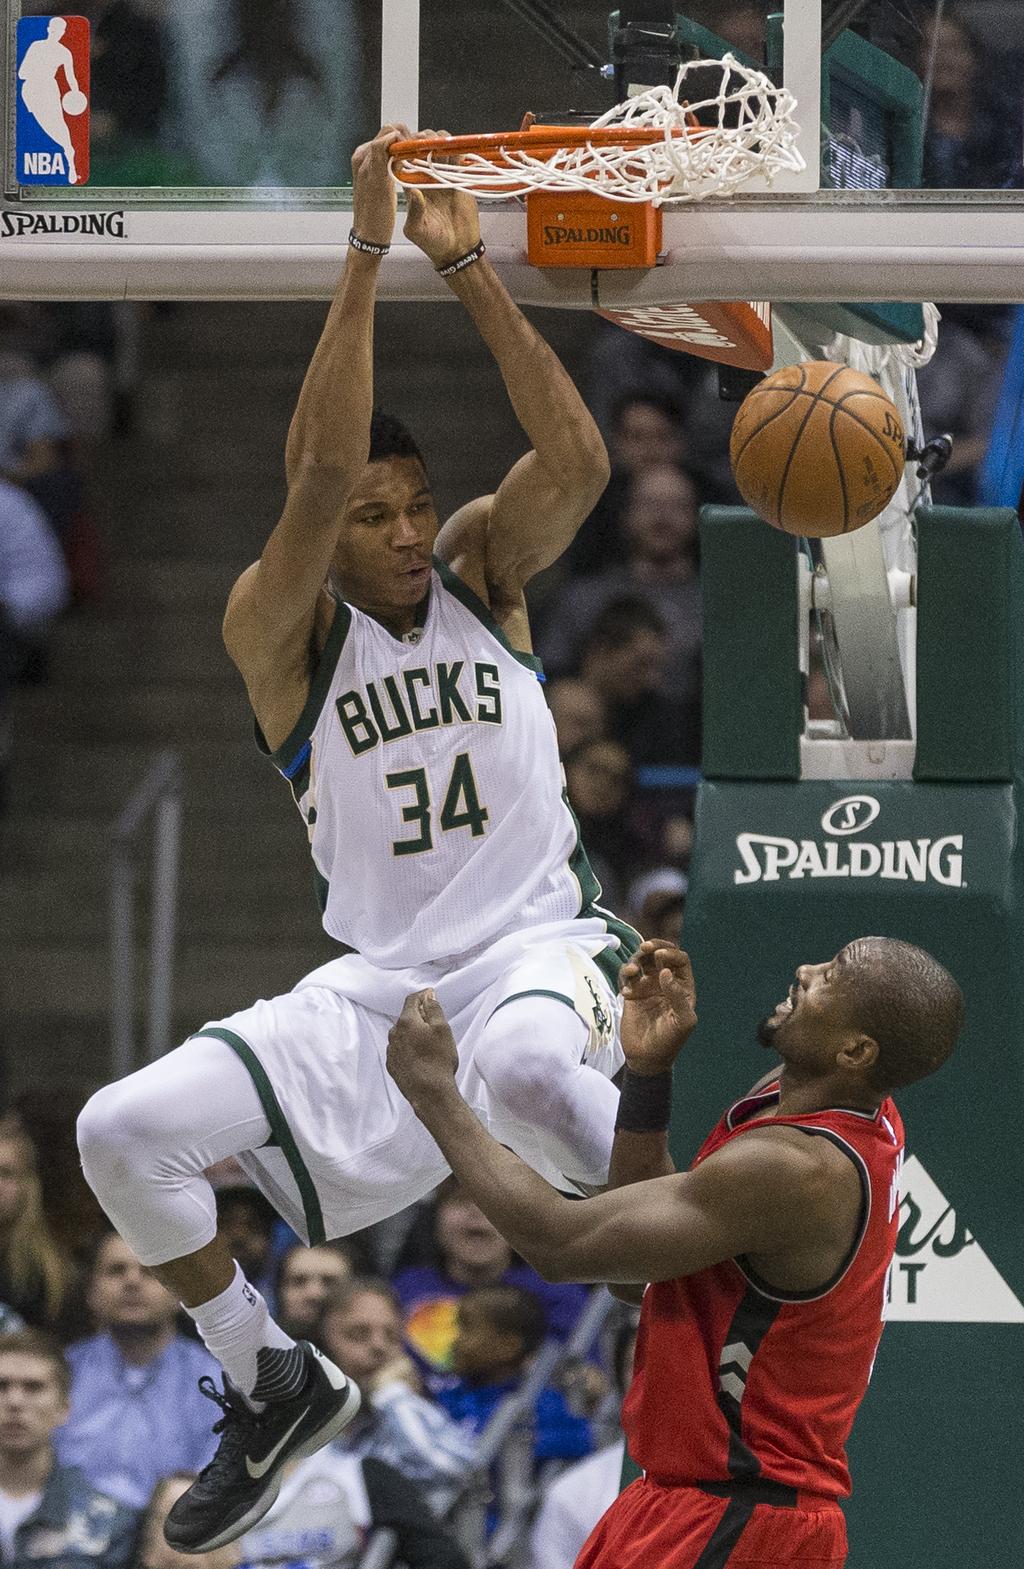 Milwaukee Bucks' Giannis Antetokounmpo dunks the ball as Toronto Raptors' Serge Ibaka looks on during the first half of an NBA basketba...